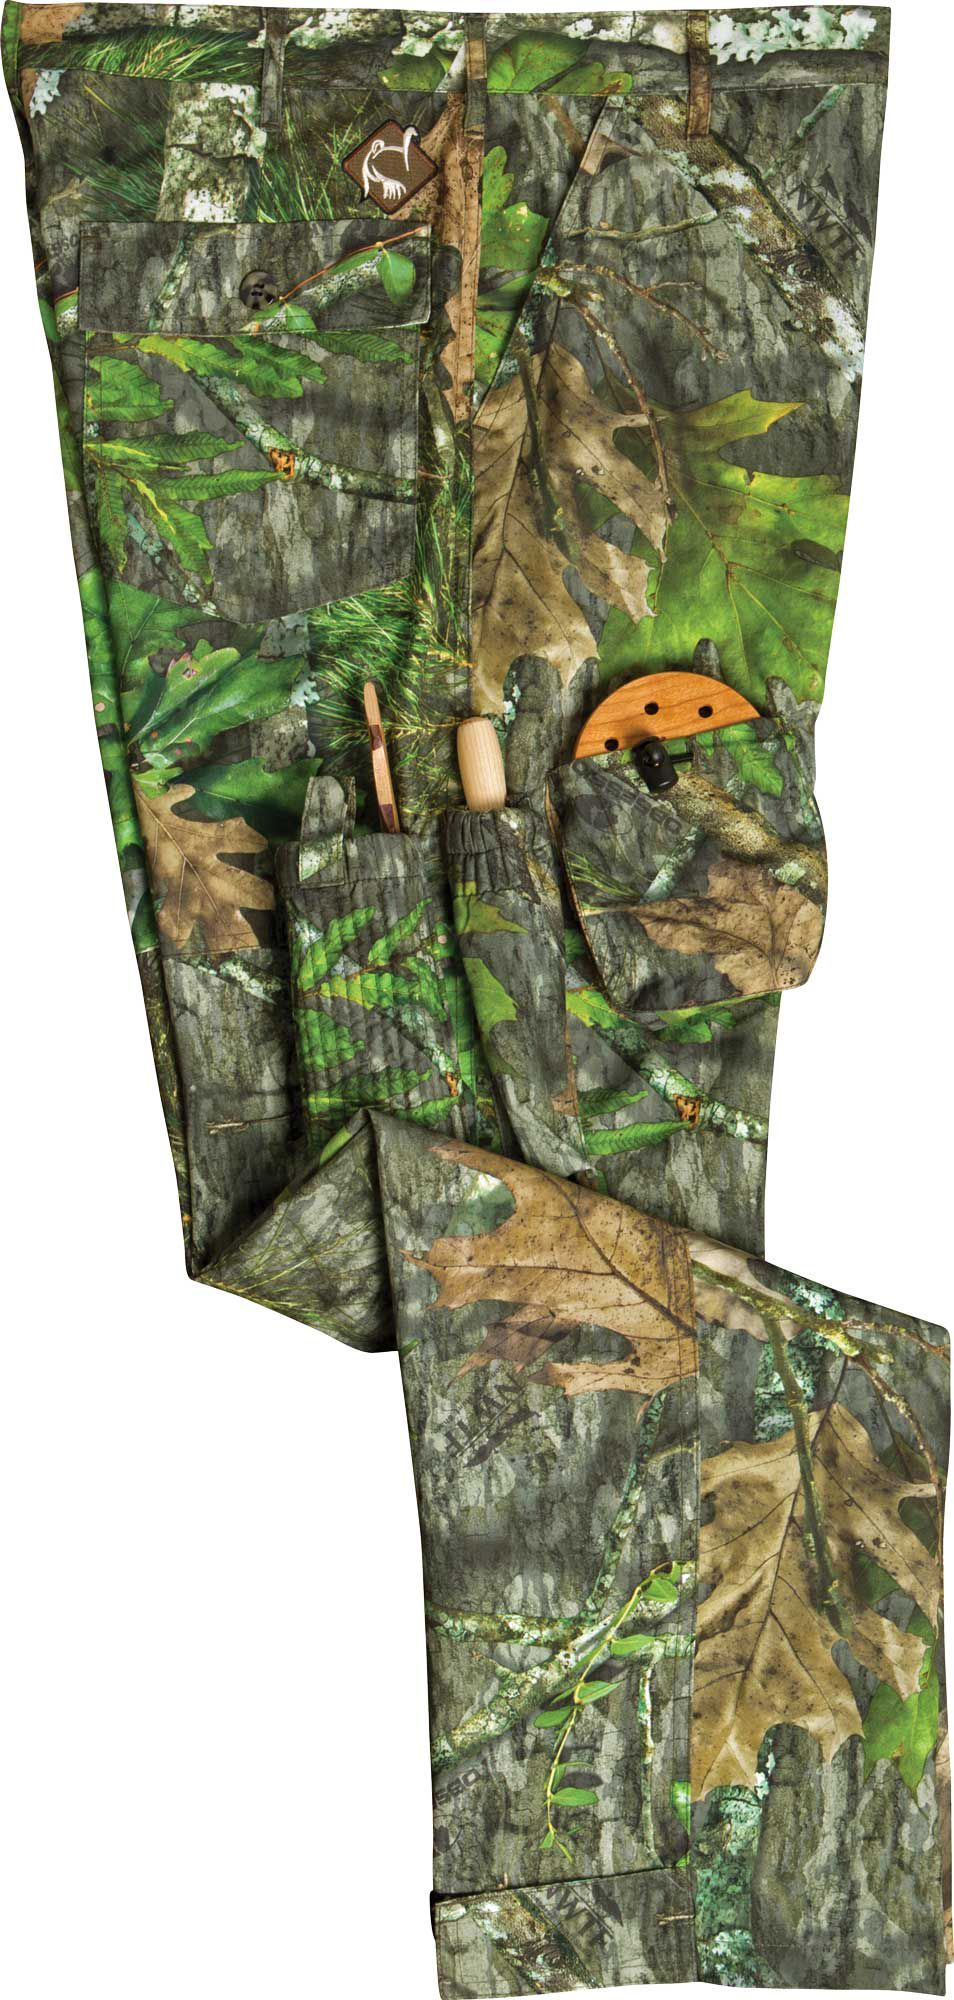 Ol' Tom Men's Technical Turkey Hunting Pants, Size: XXL, Mossy Oak Obsession Nwtf thumbnail